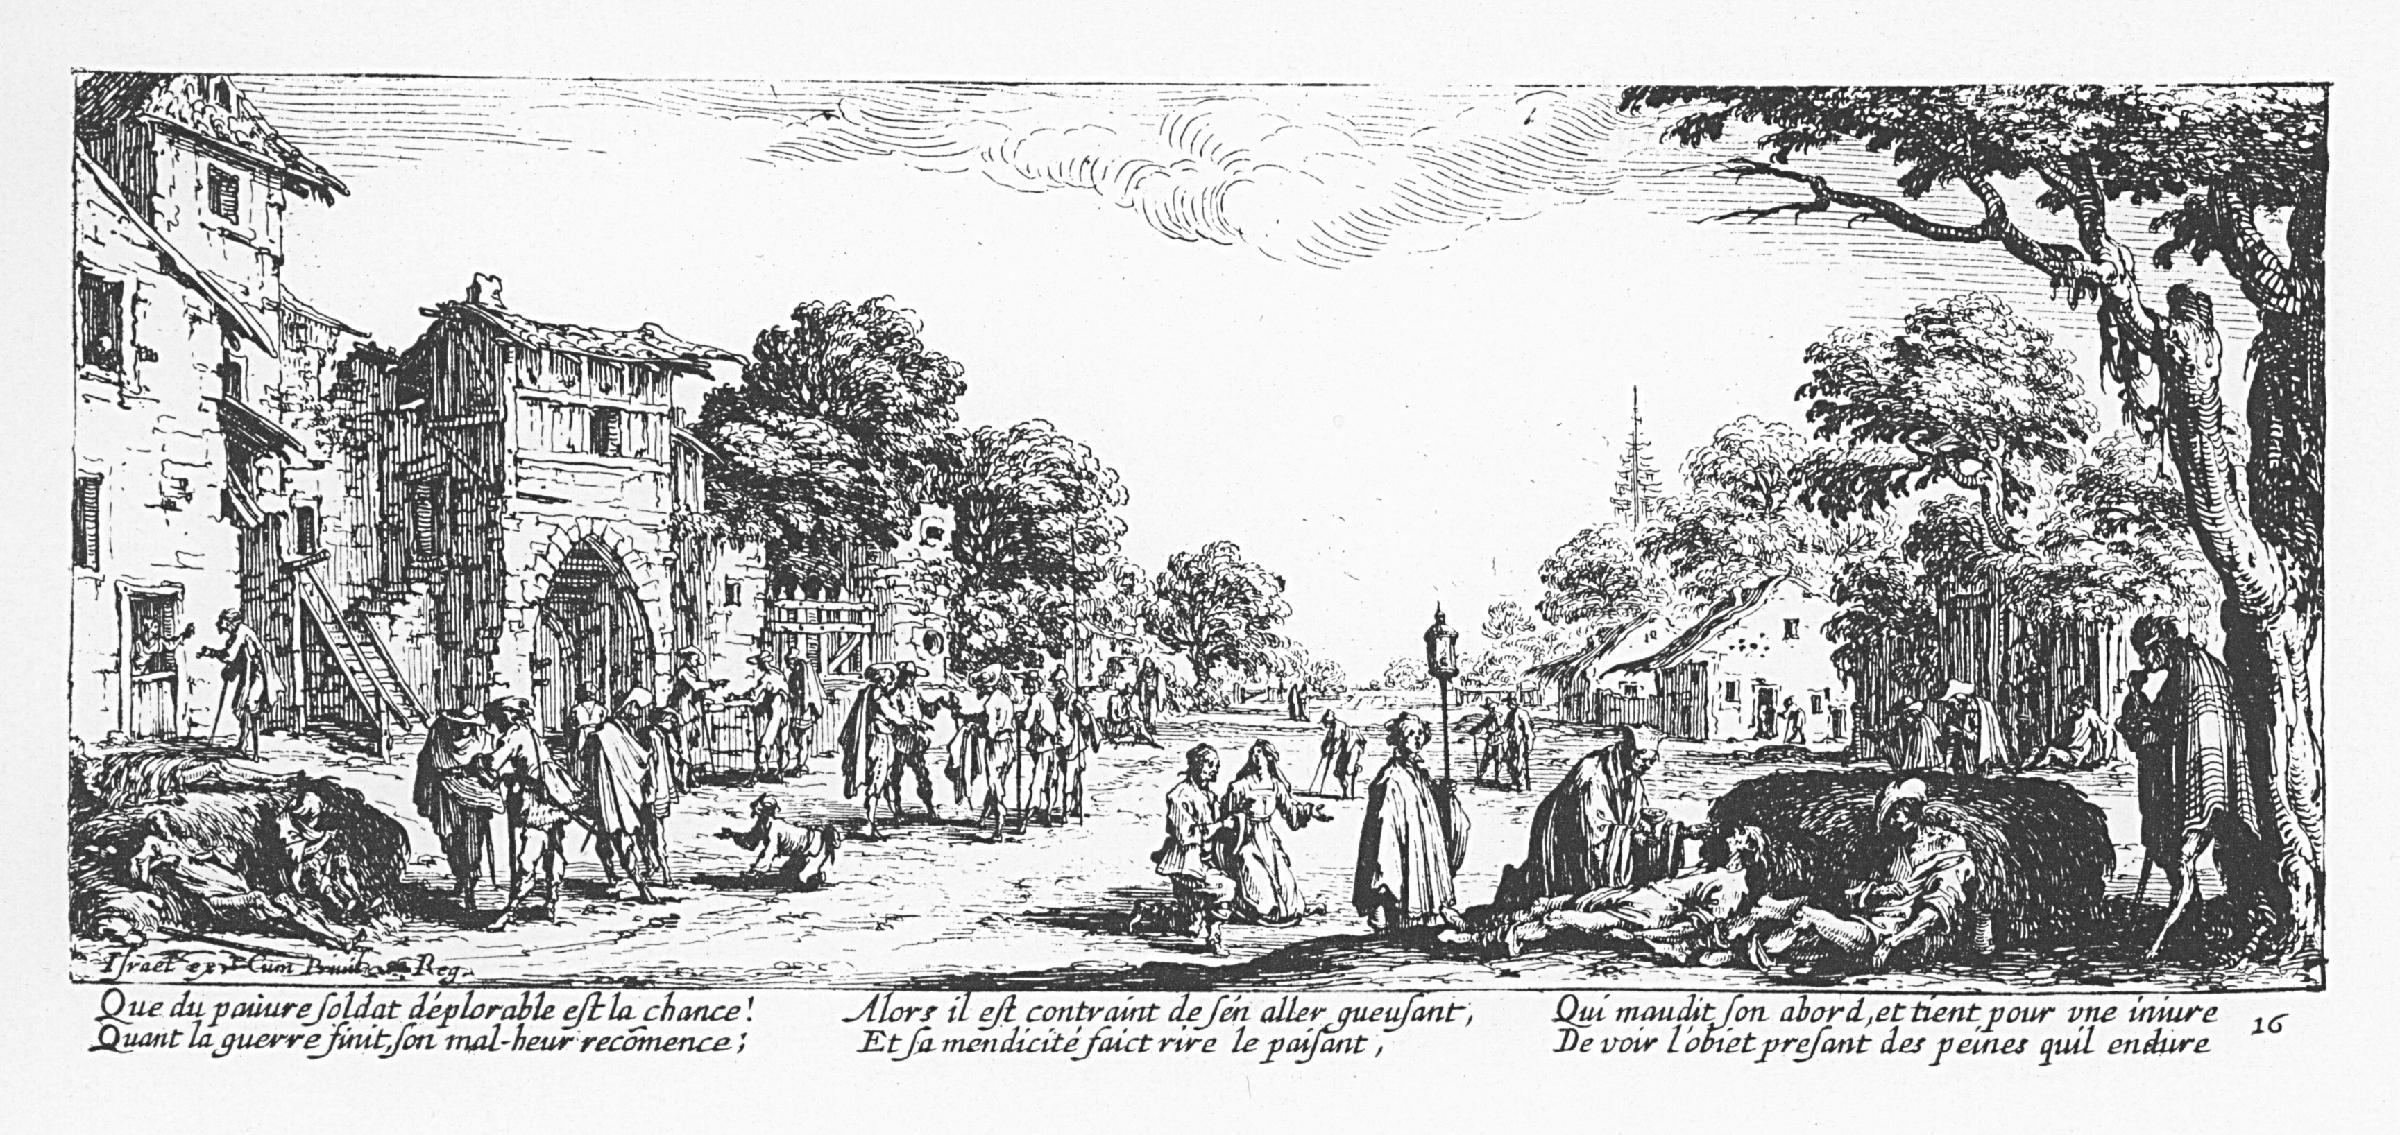 Les mendiants et les mourants.Sumber gambar: wikimedia.org